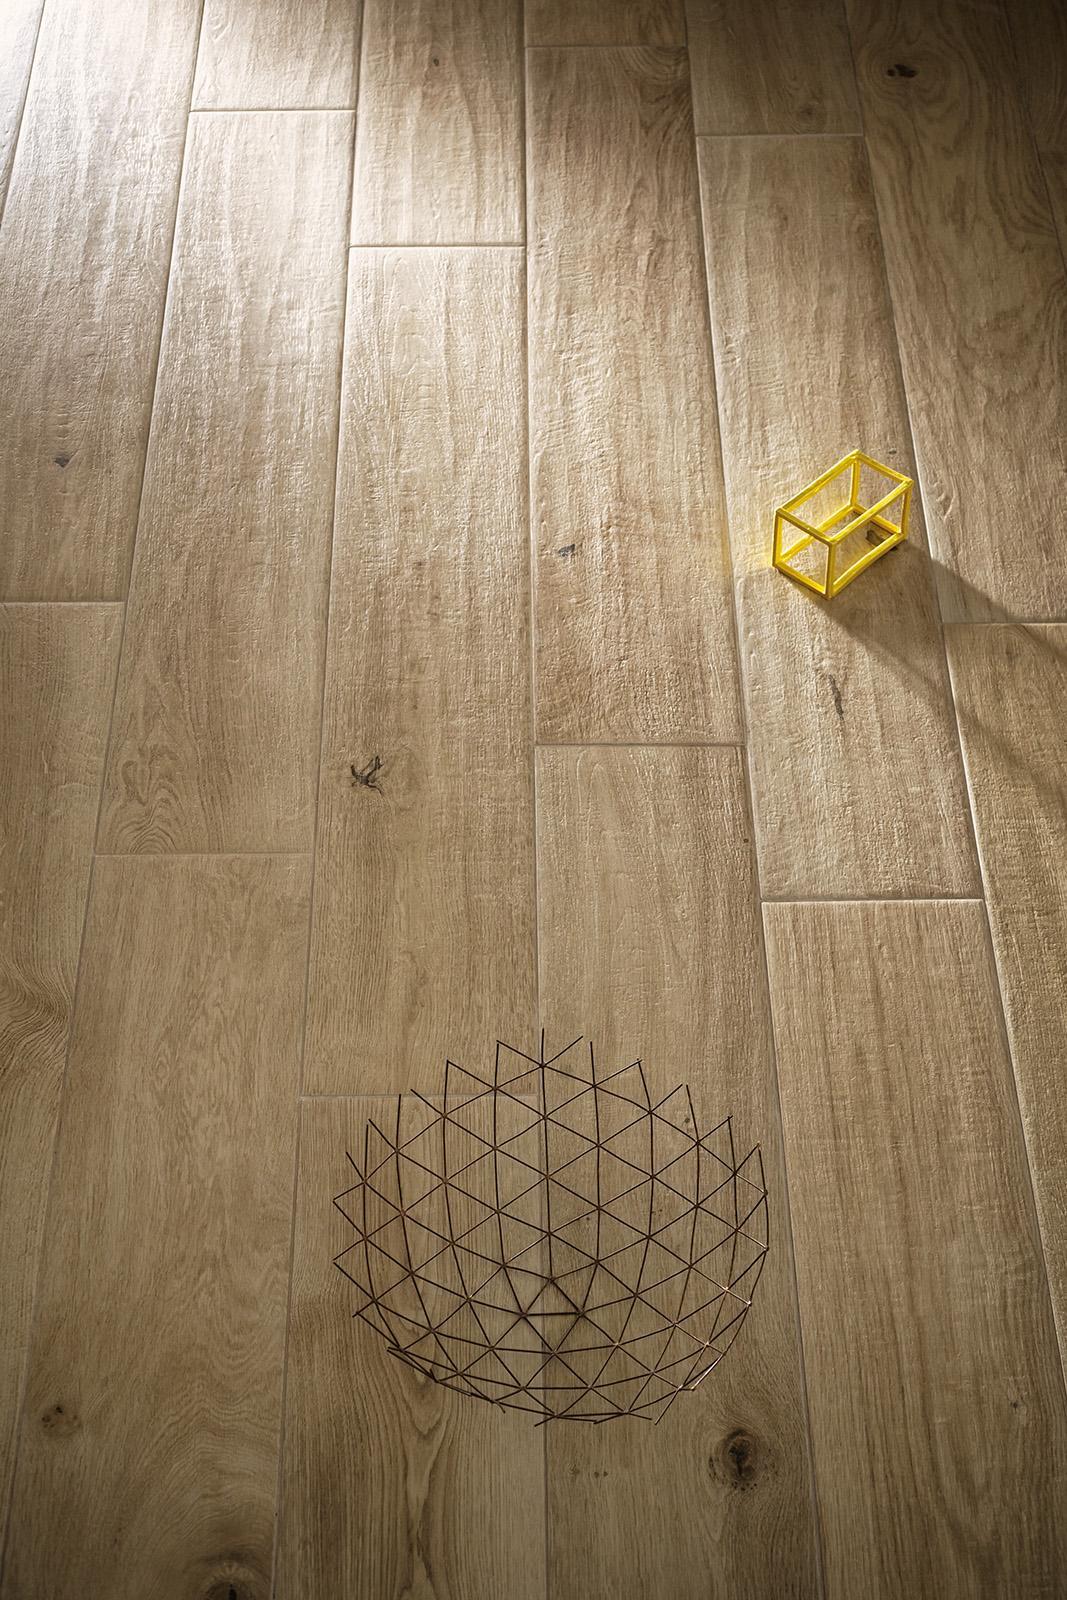 2 1 4 oak hardwood flooring of treverkever hard wood effect stoneware flooring marazzi with regard to treverkever wood effect bathroom